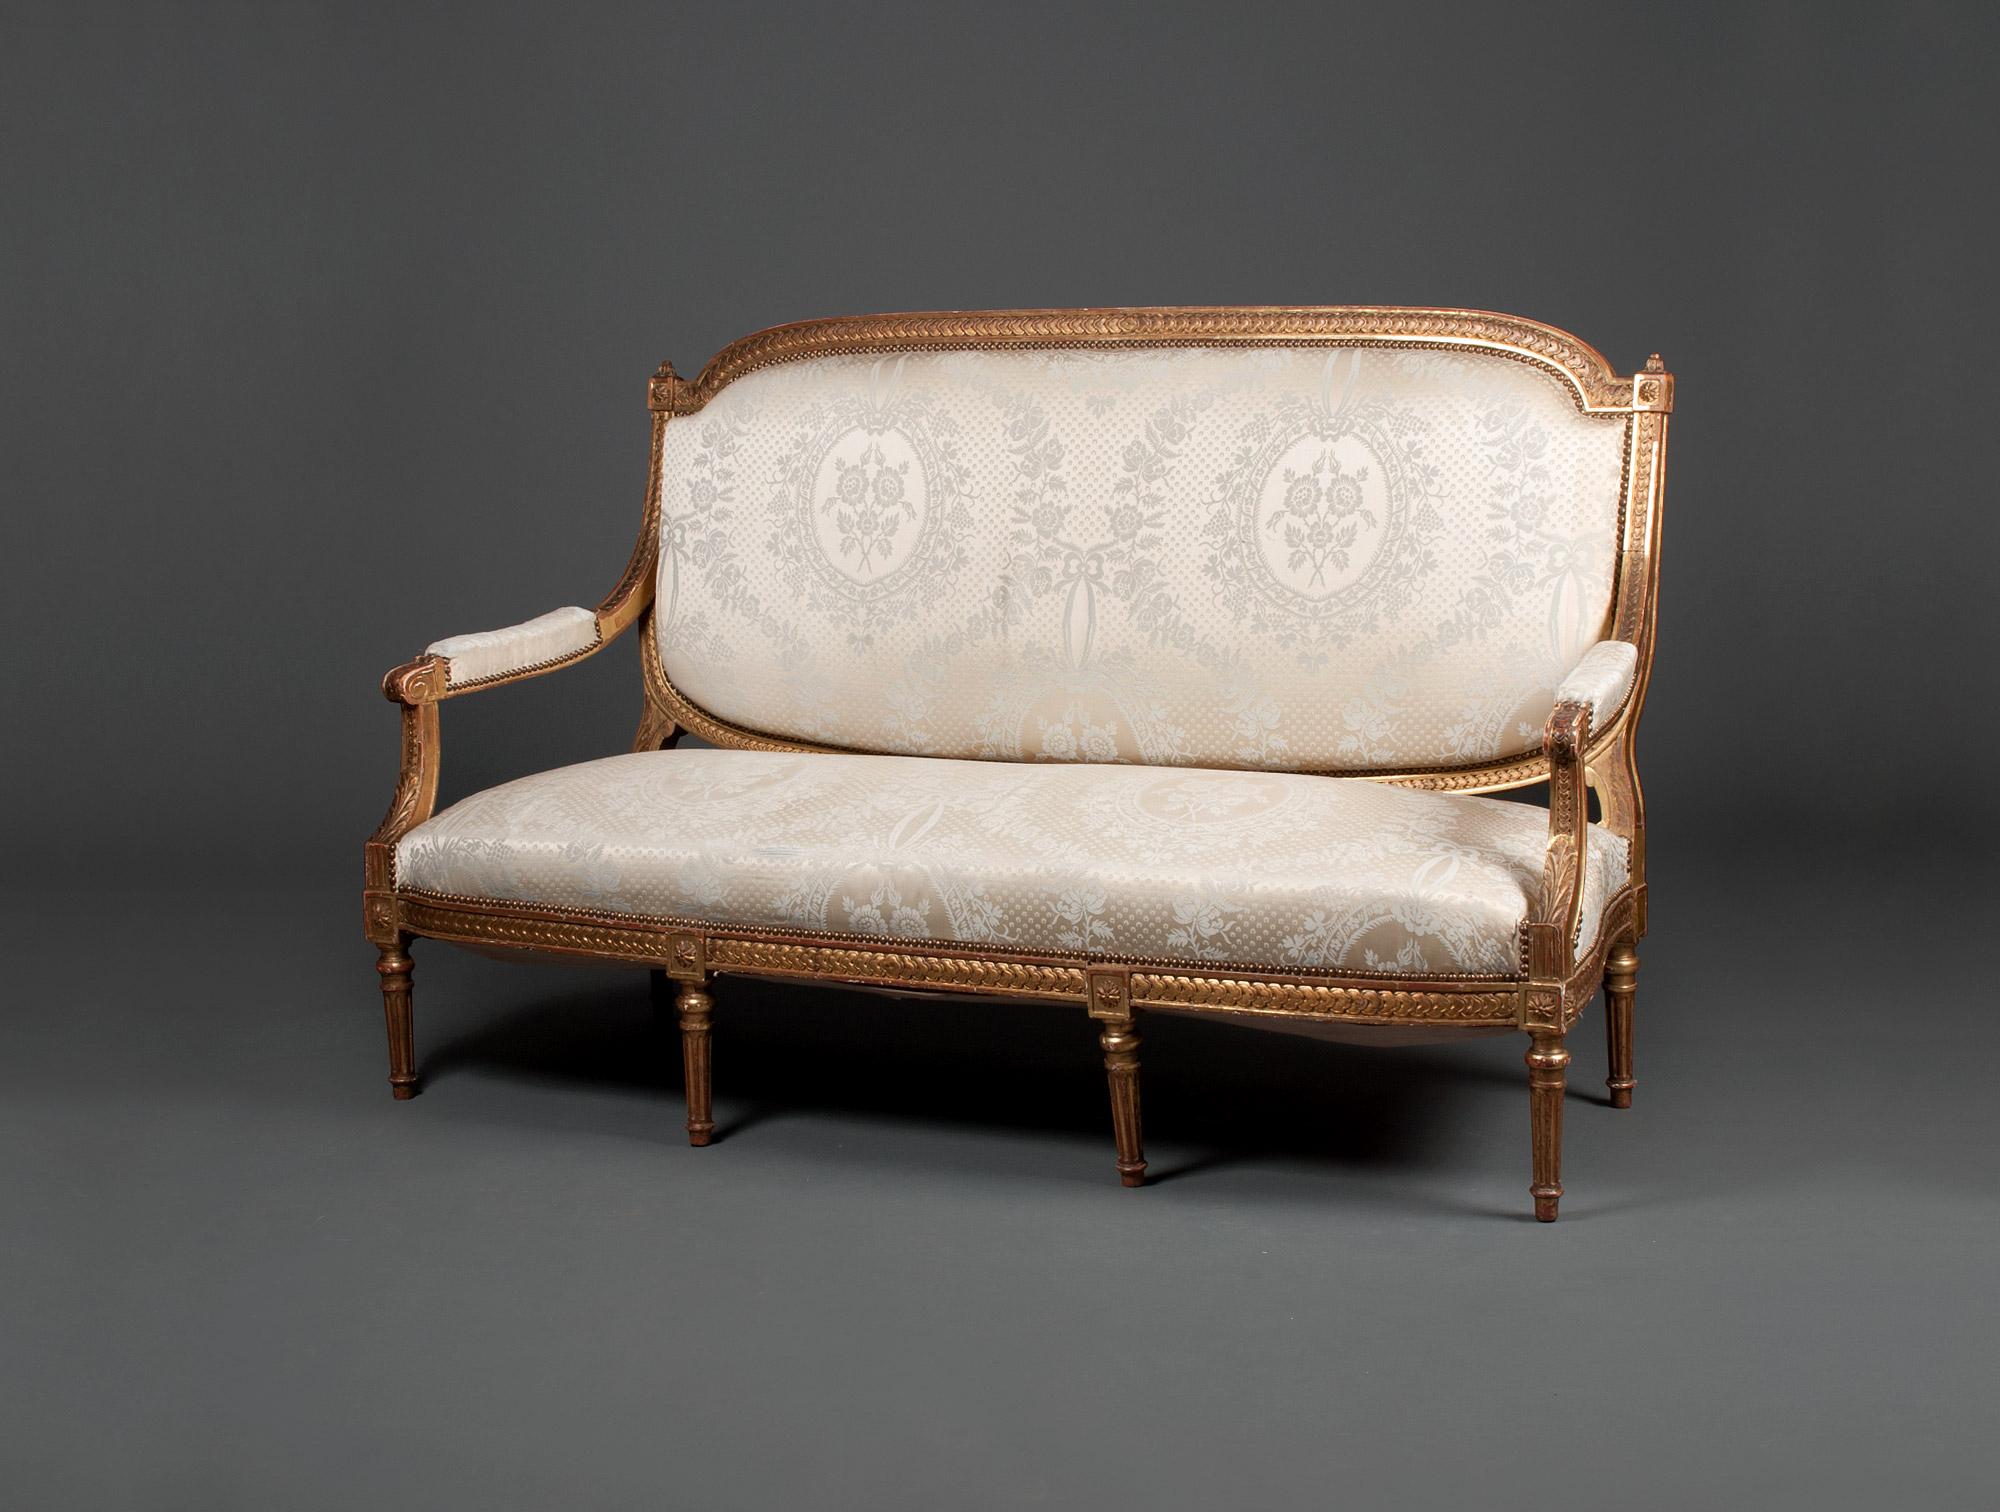 canap louis xvi soubrier louer si ges canap xviiie. Black Bedroom Furniture Sets. Home Design Ideas